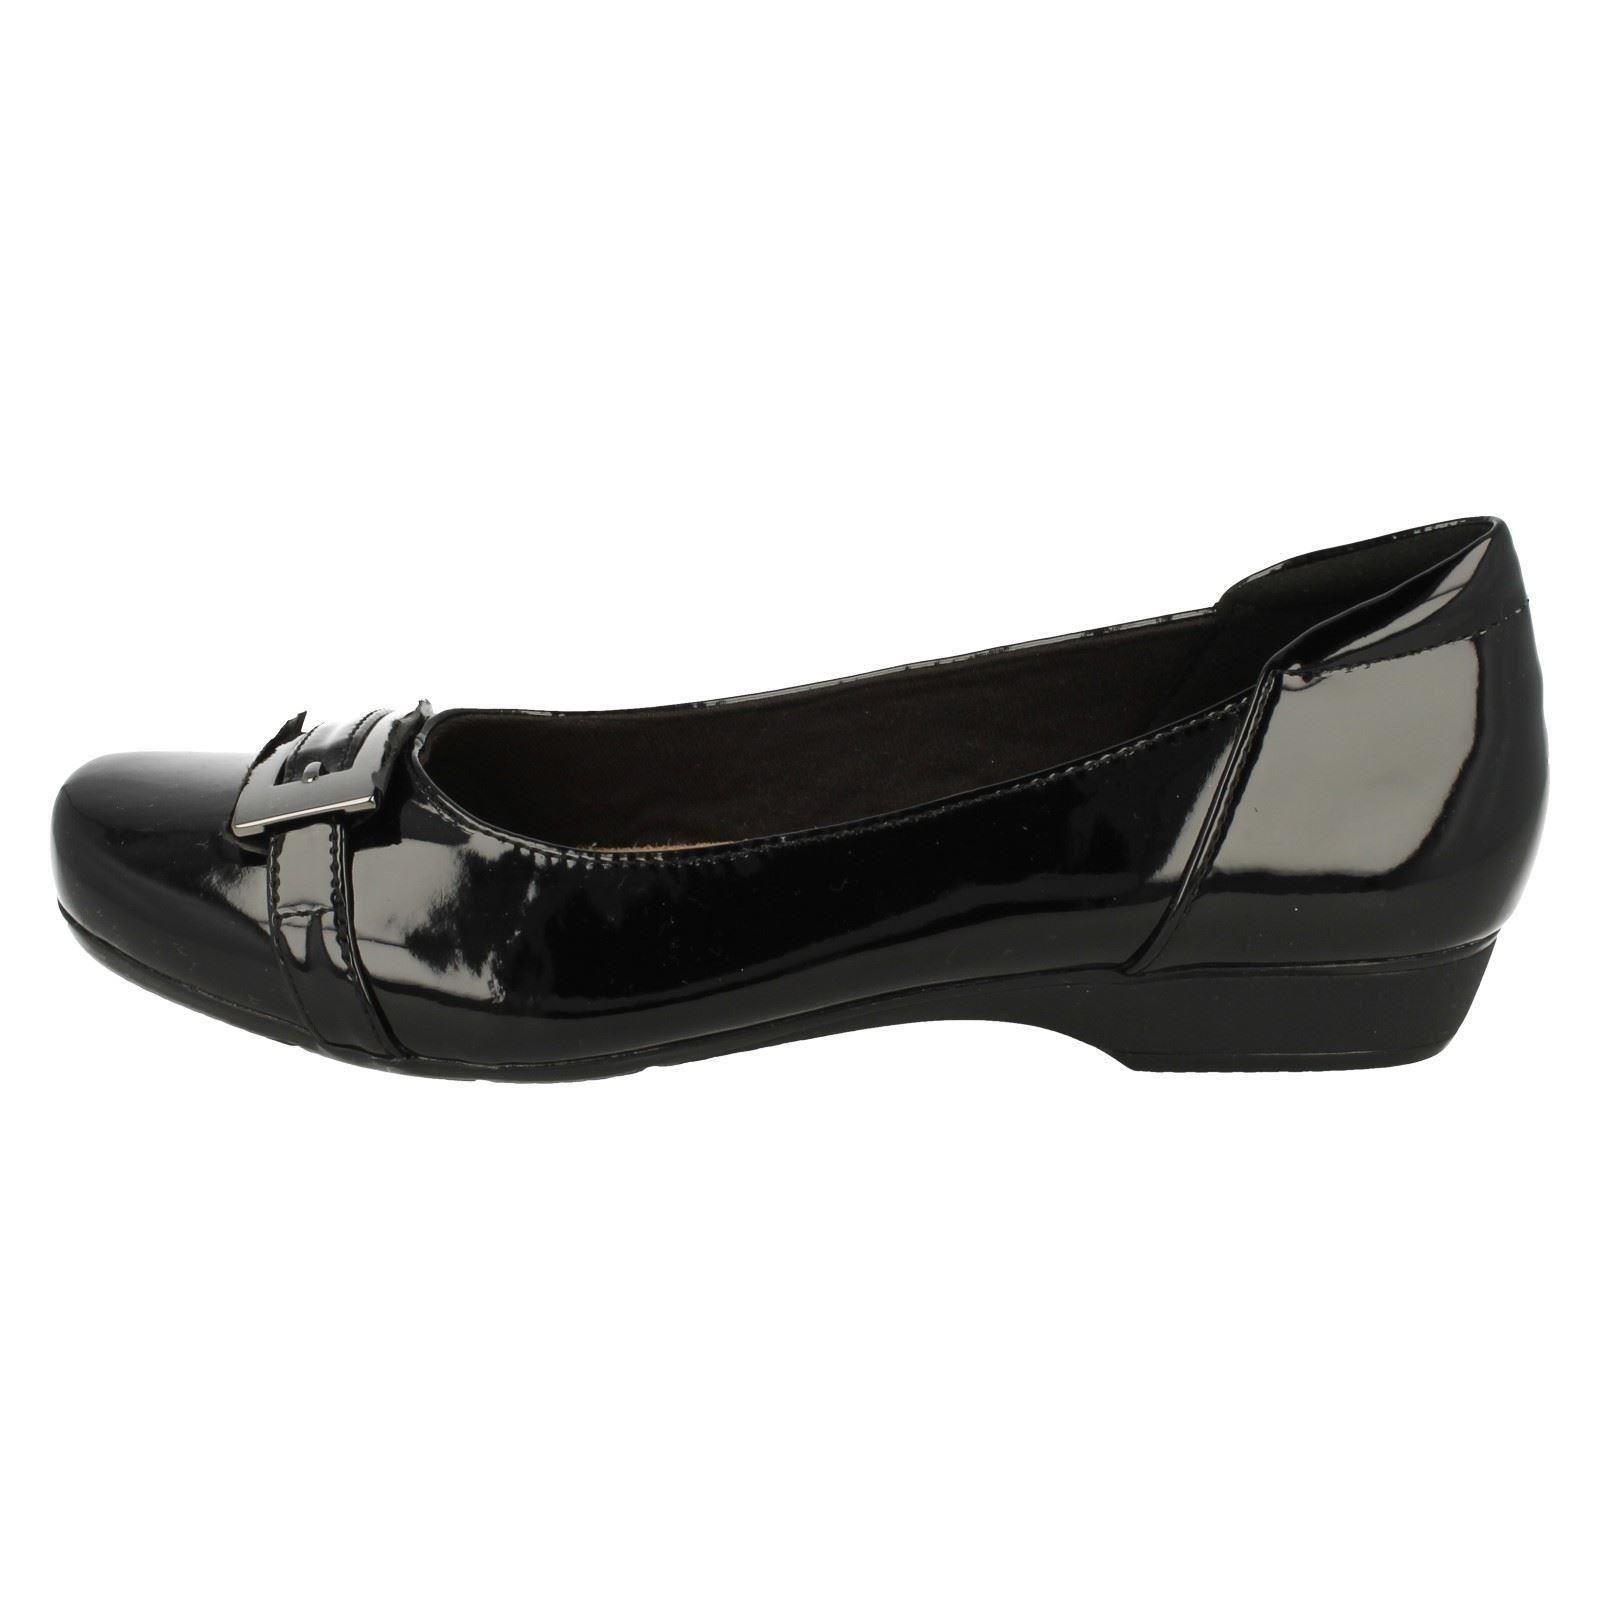 Zapatos Mujer West Clarks Elegante Blanche Cierres Sin OqxwP8Zq